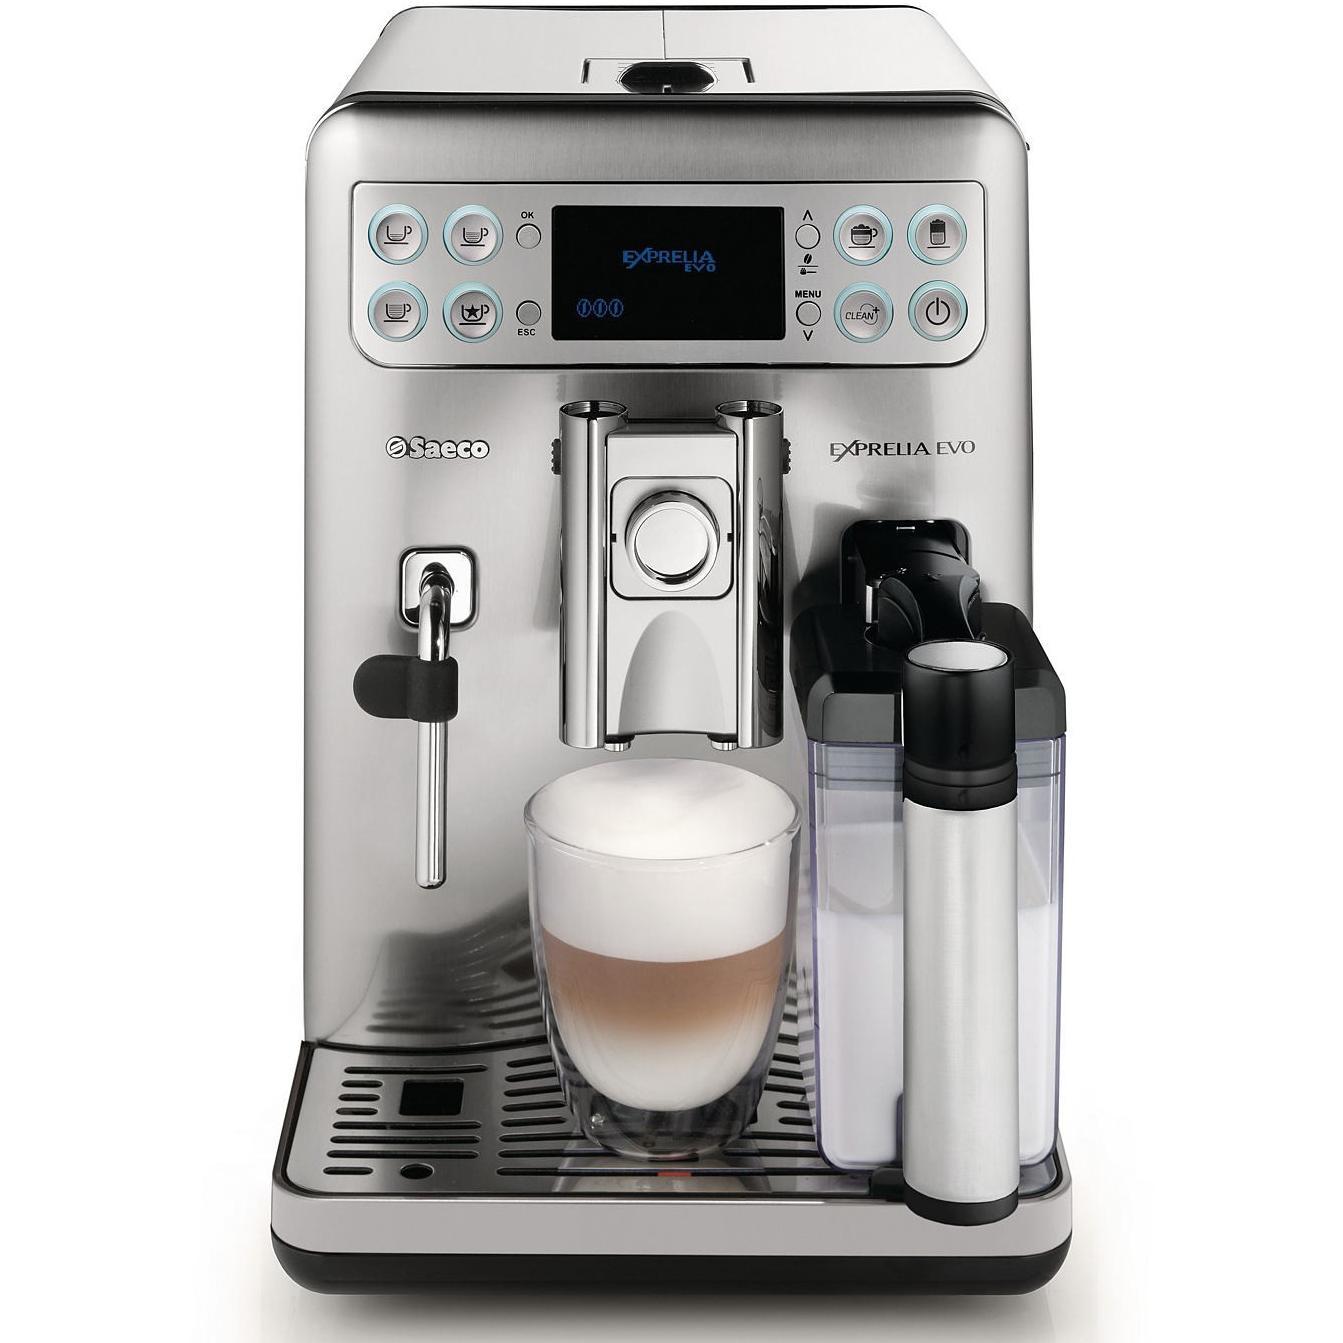 075020033291 upc saeco hd8857 47 philips exprellia evo fully automatic espresso upc lookup. Black Bedroom Furniture Sets. Home Design Ideas